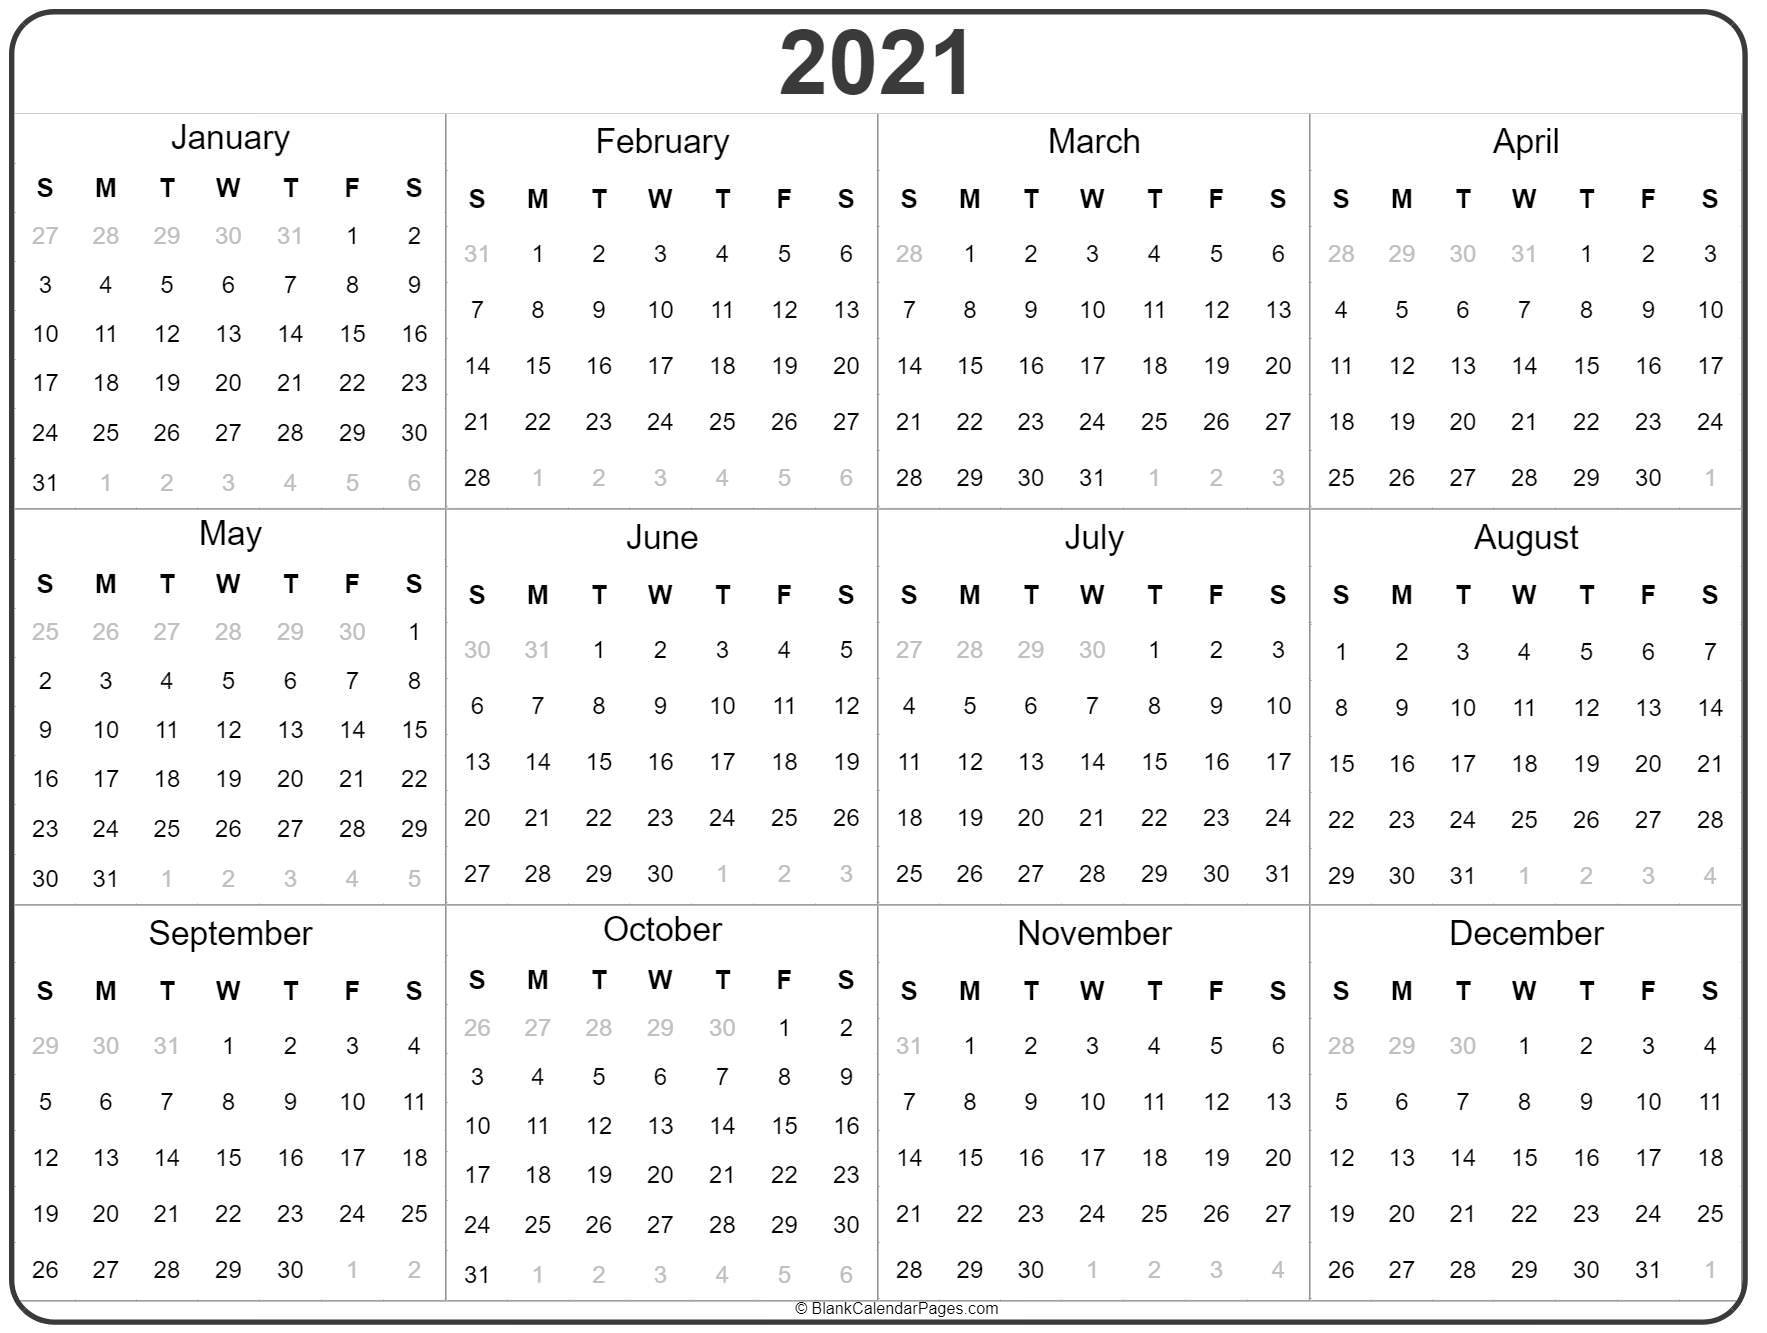 Yearly Calendar 2021 Free Printable | Avnitasoni